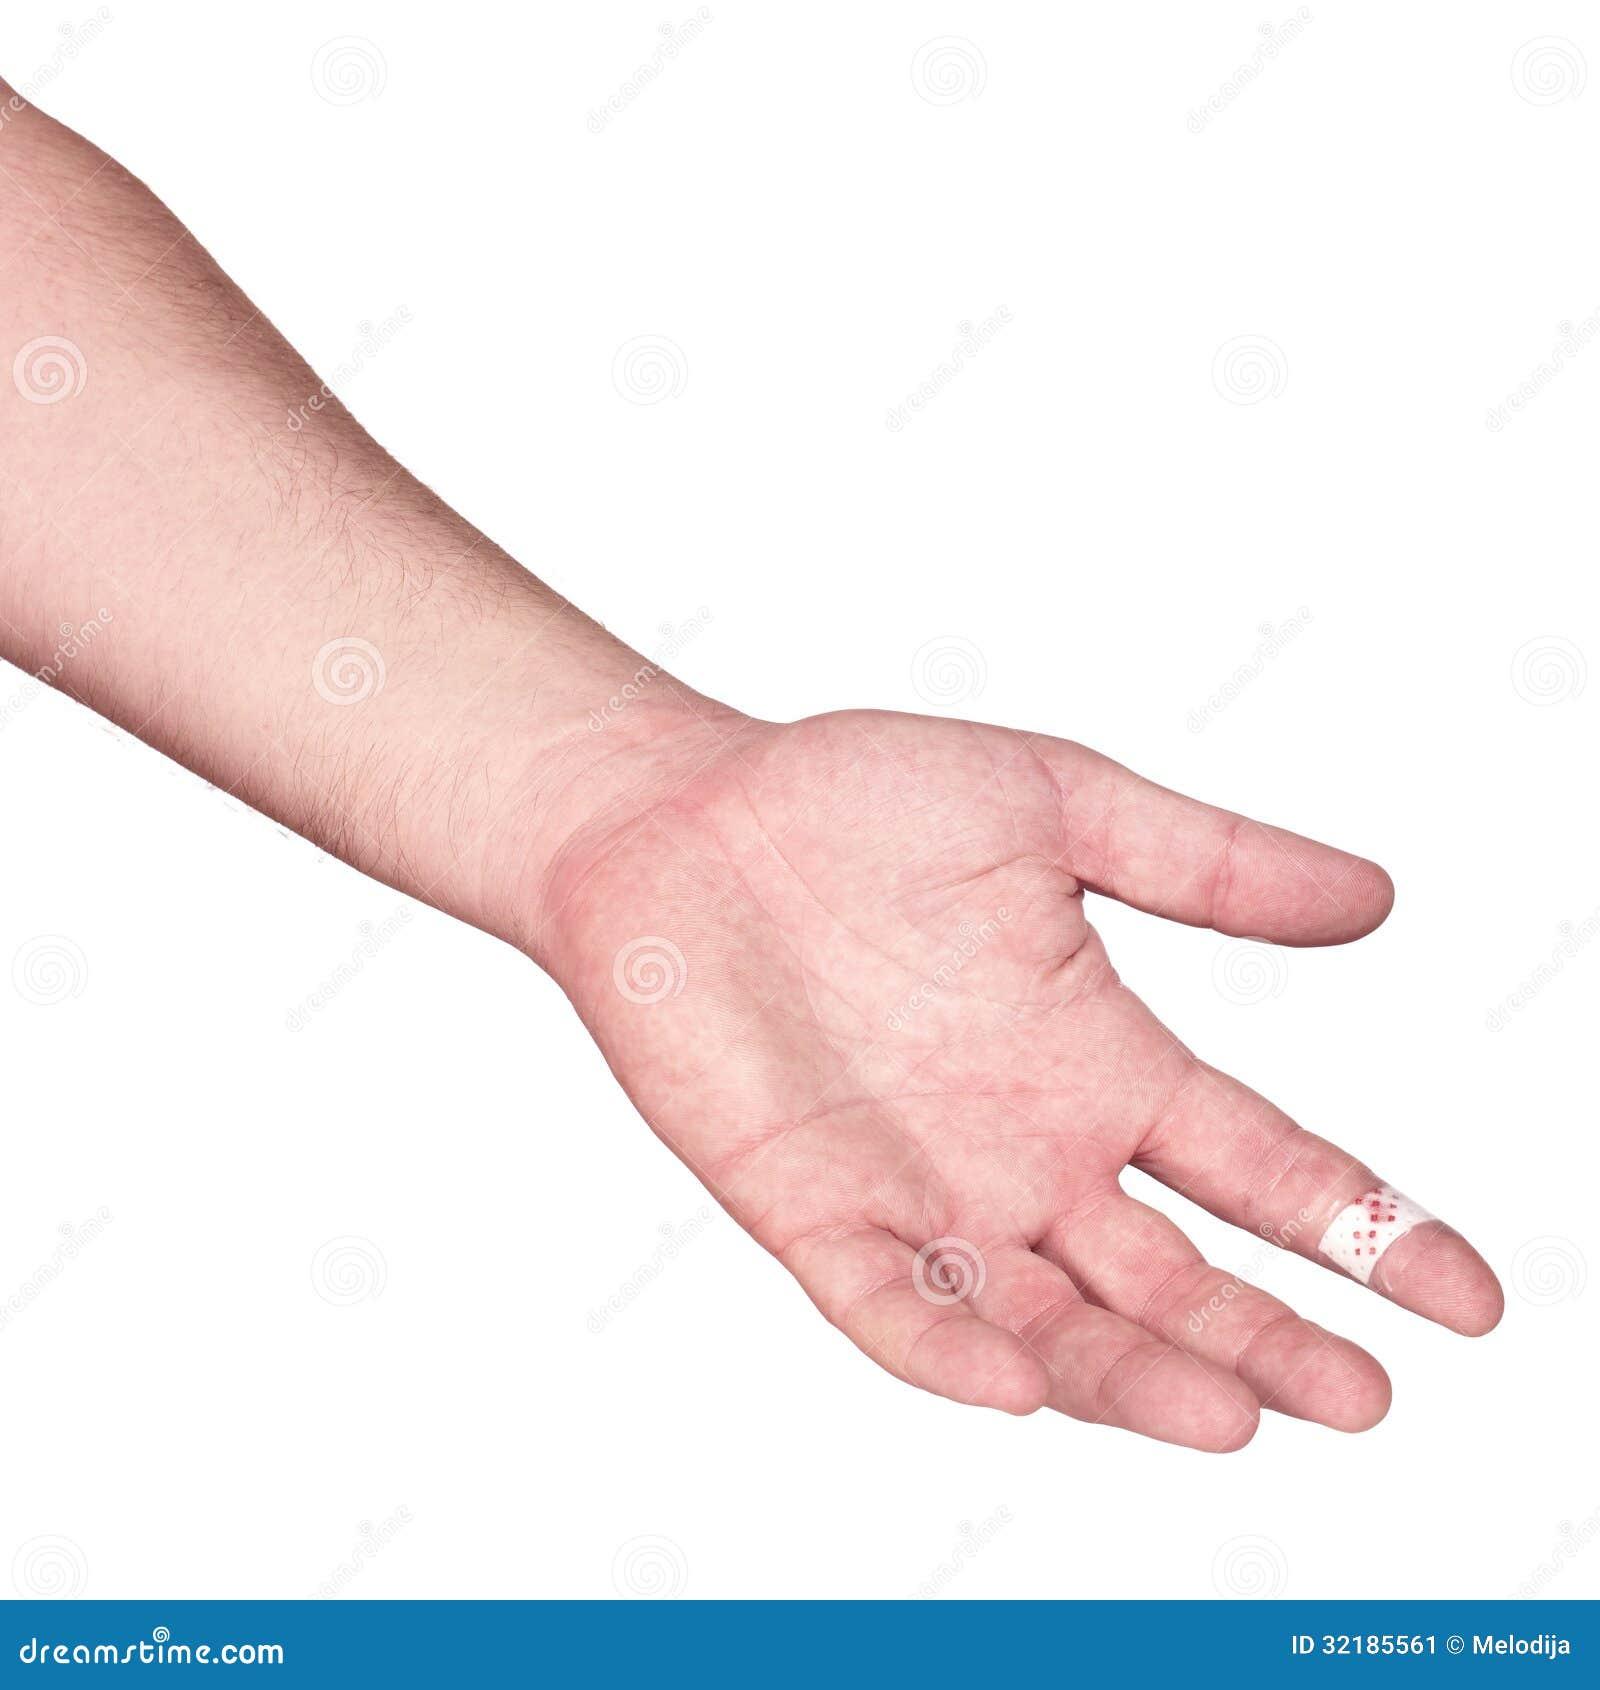 how to stop bleeding finger tip cut